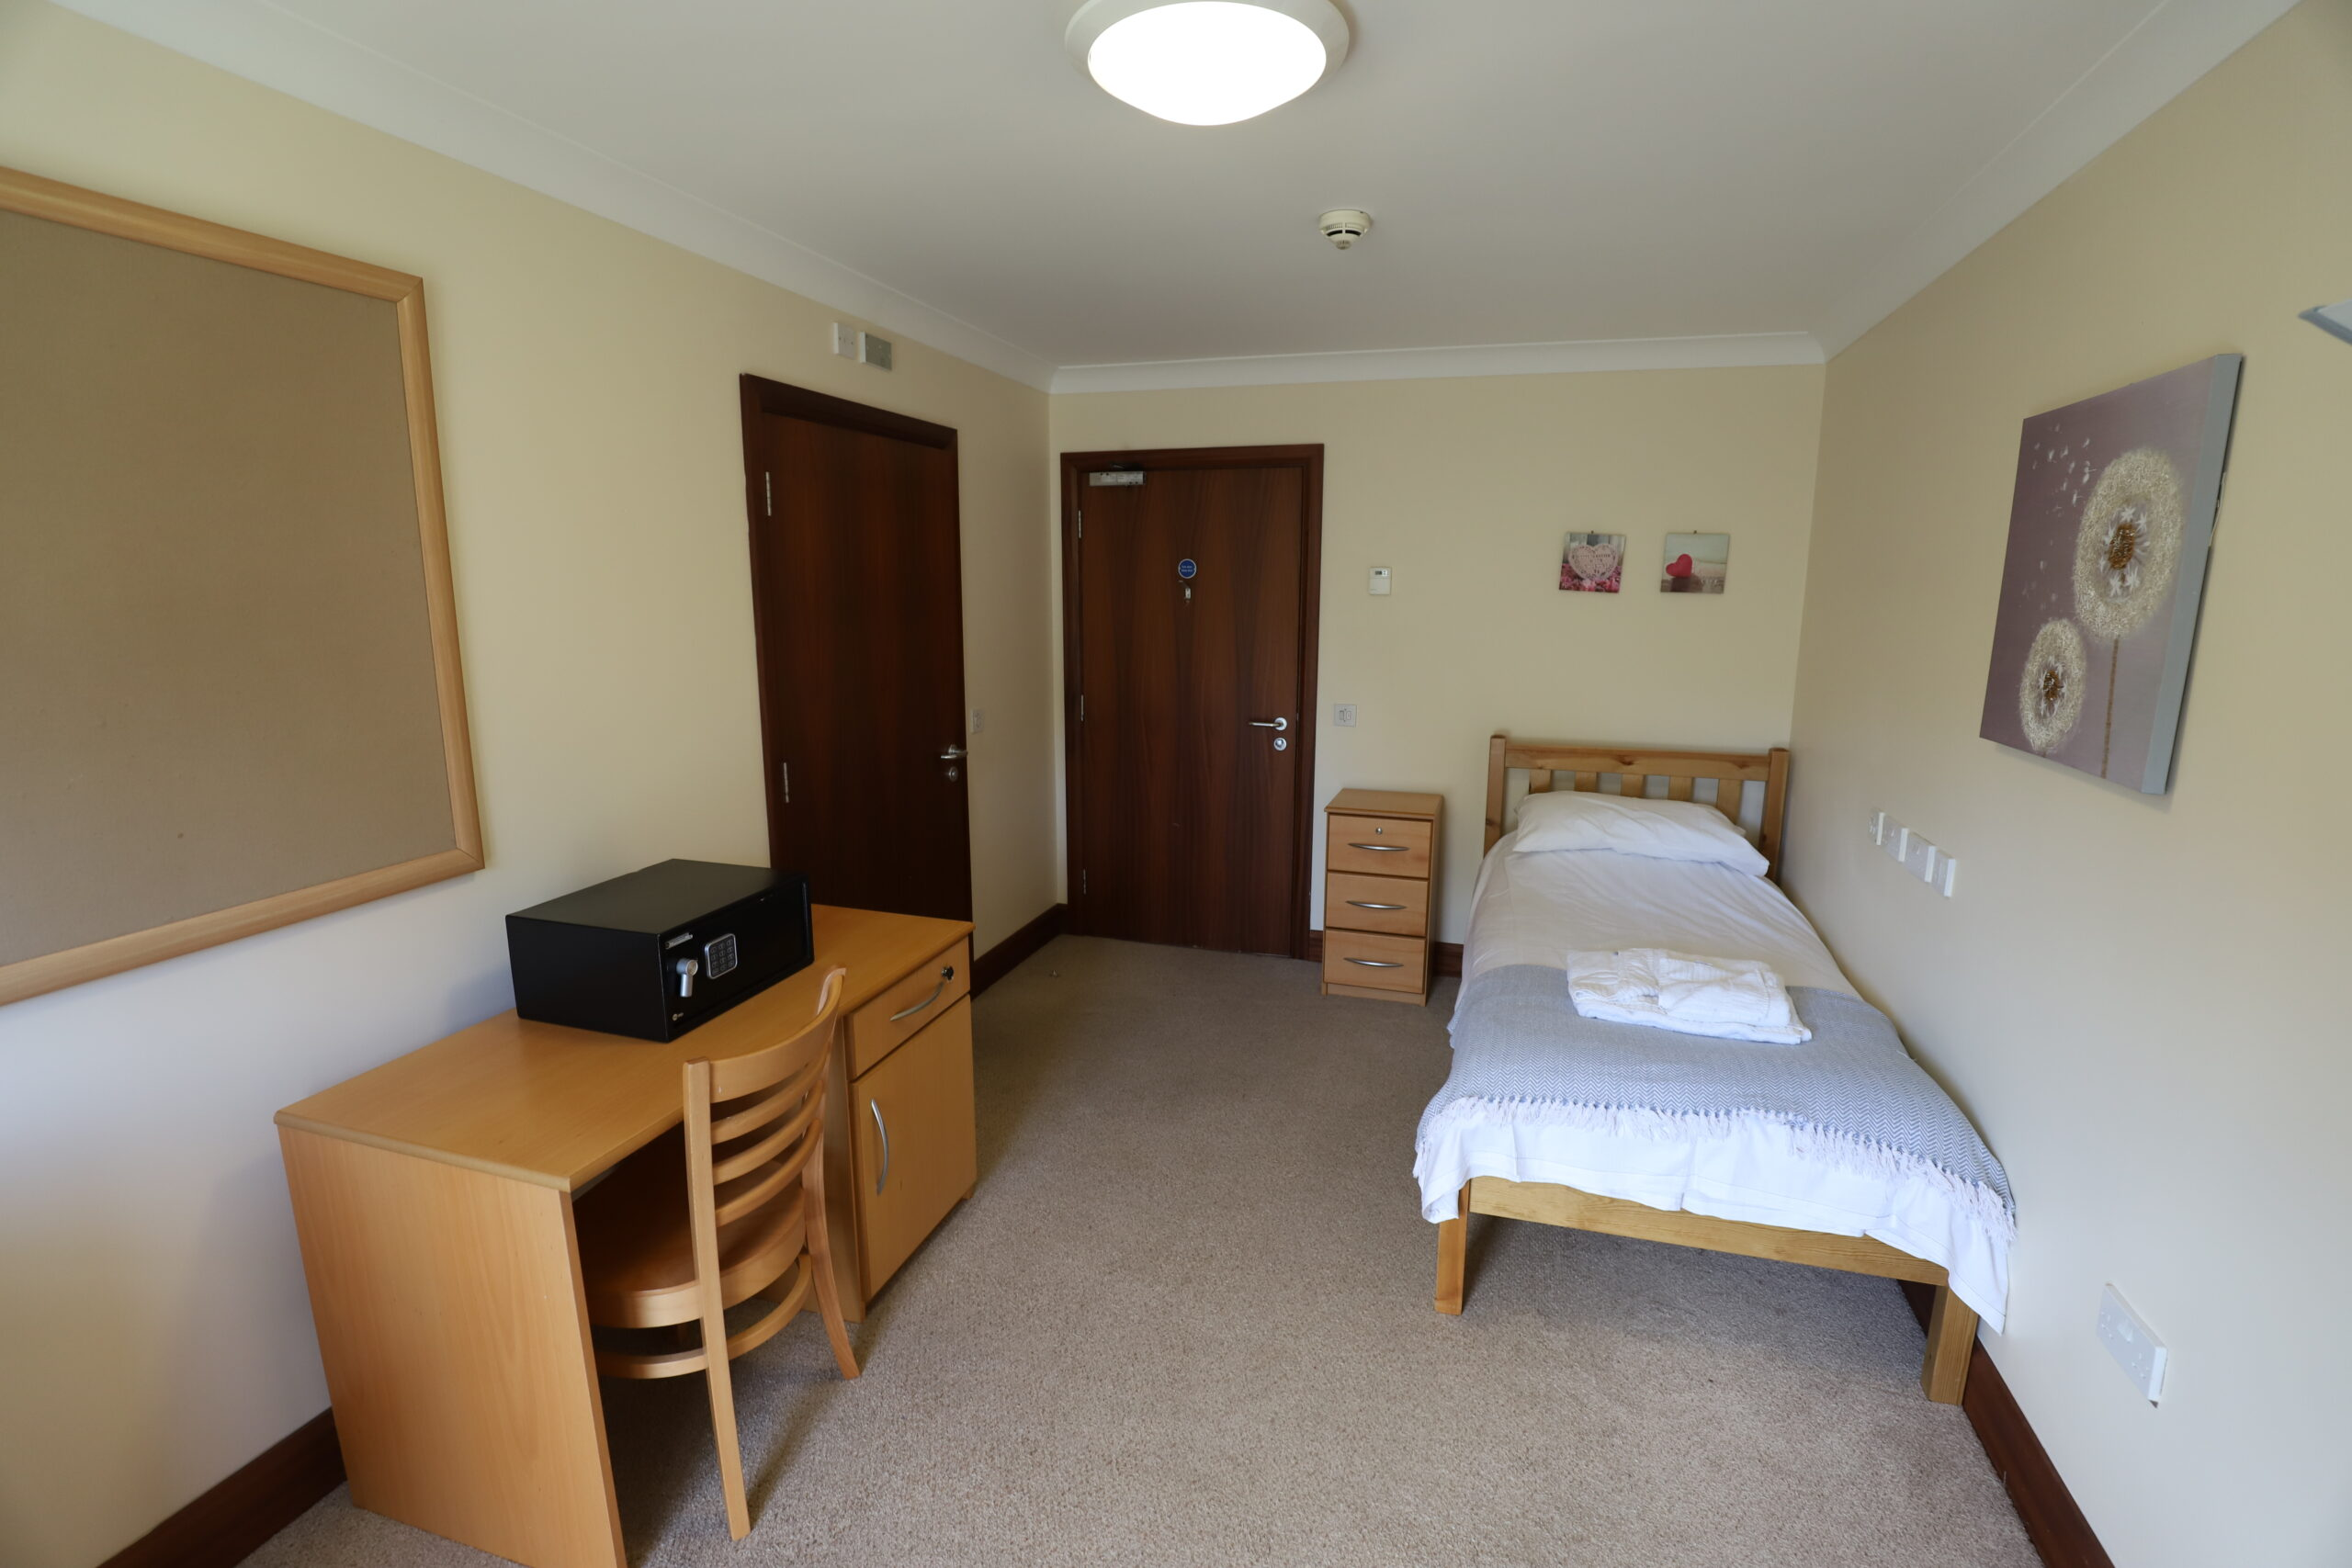 Short breaks at Derwen: bedroom